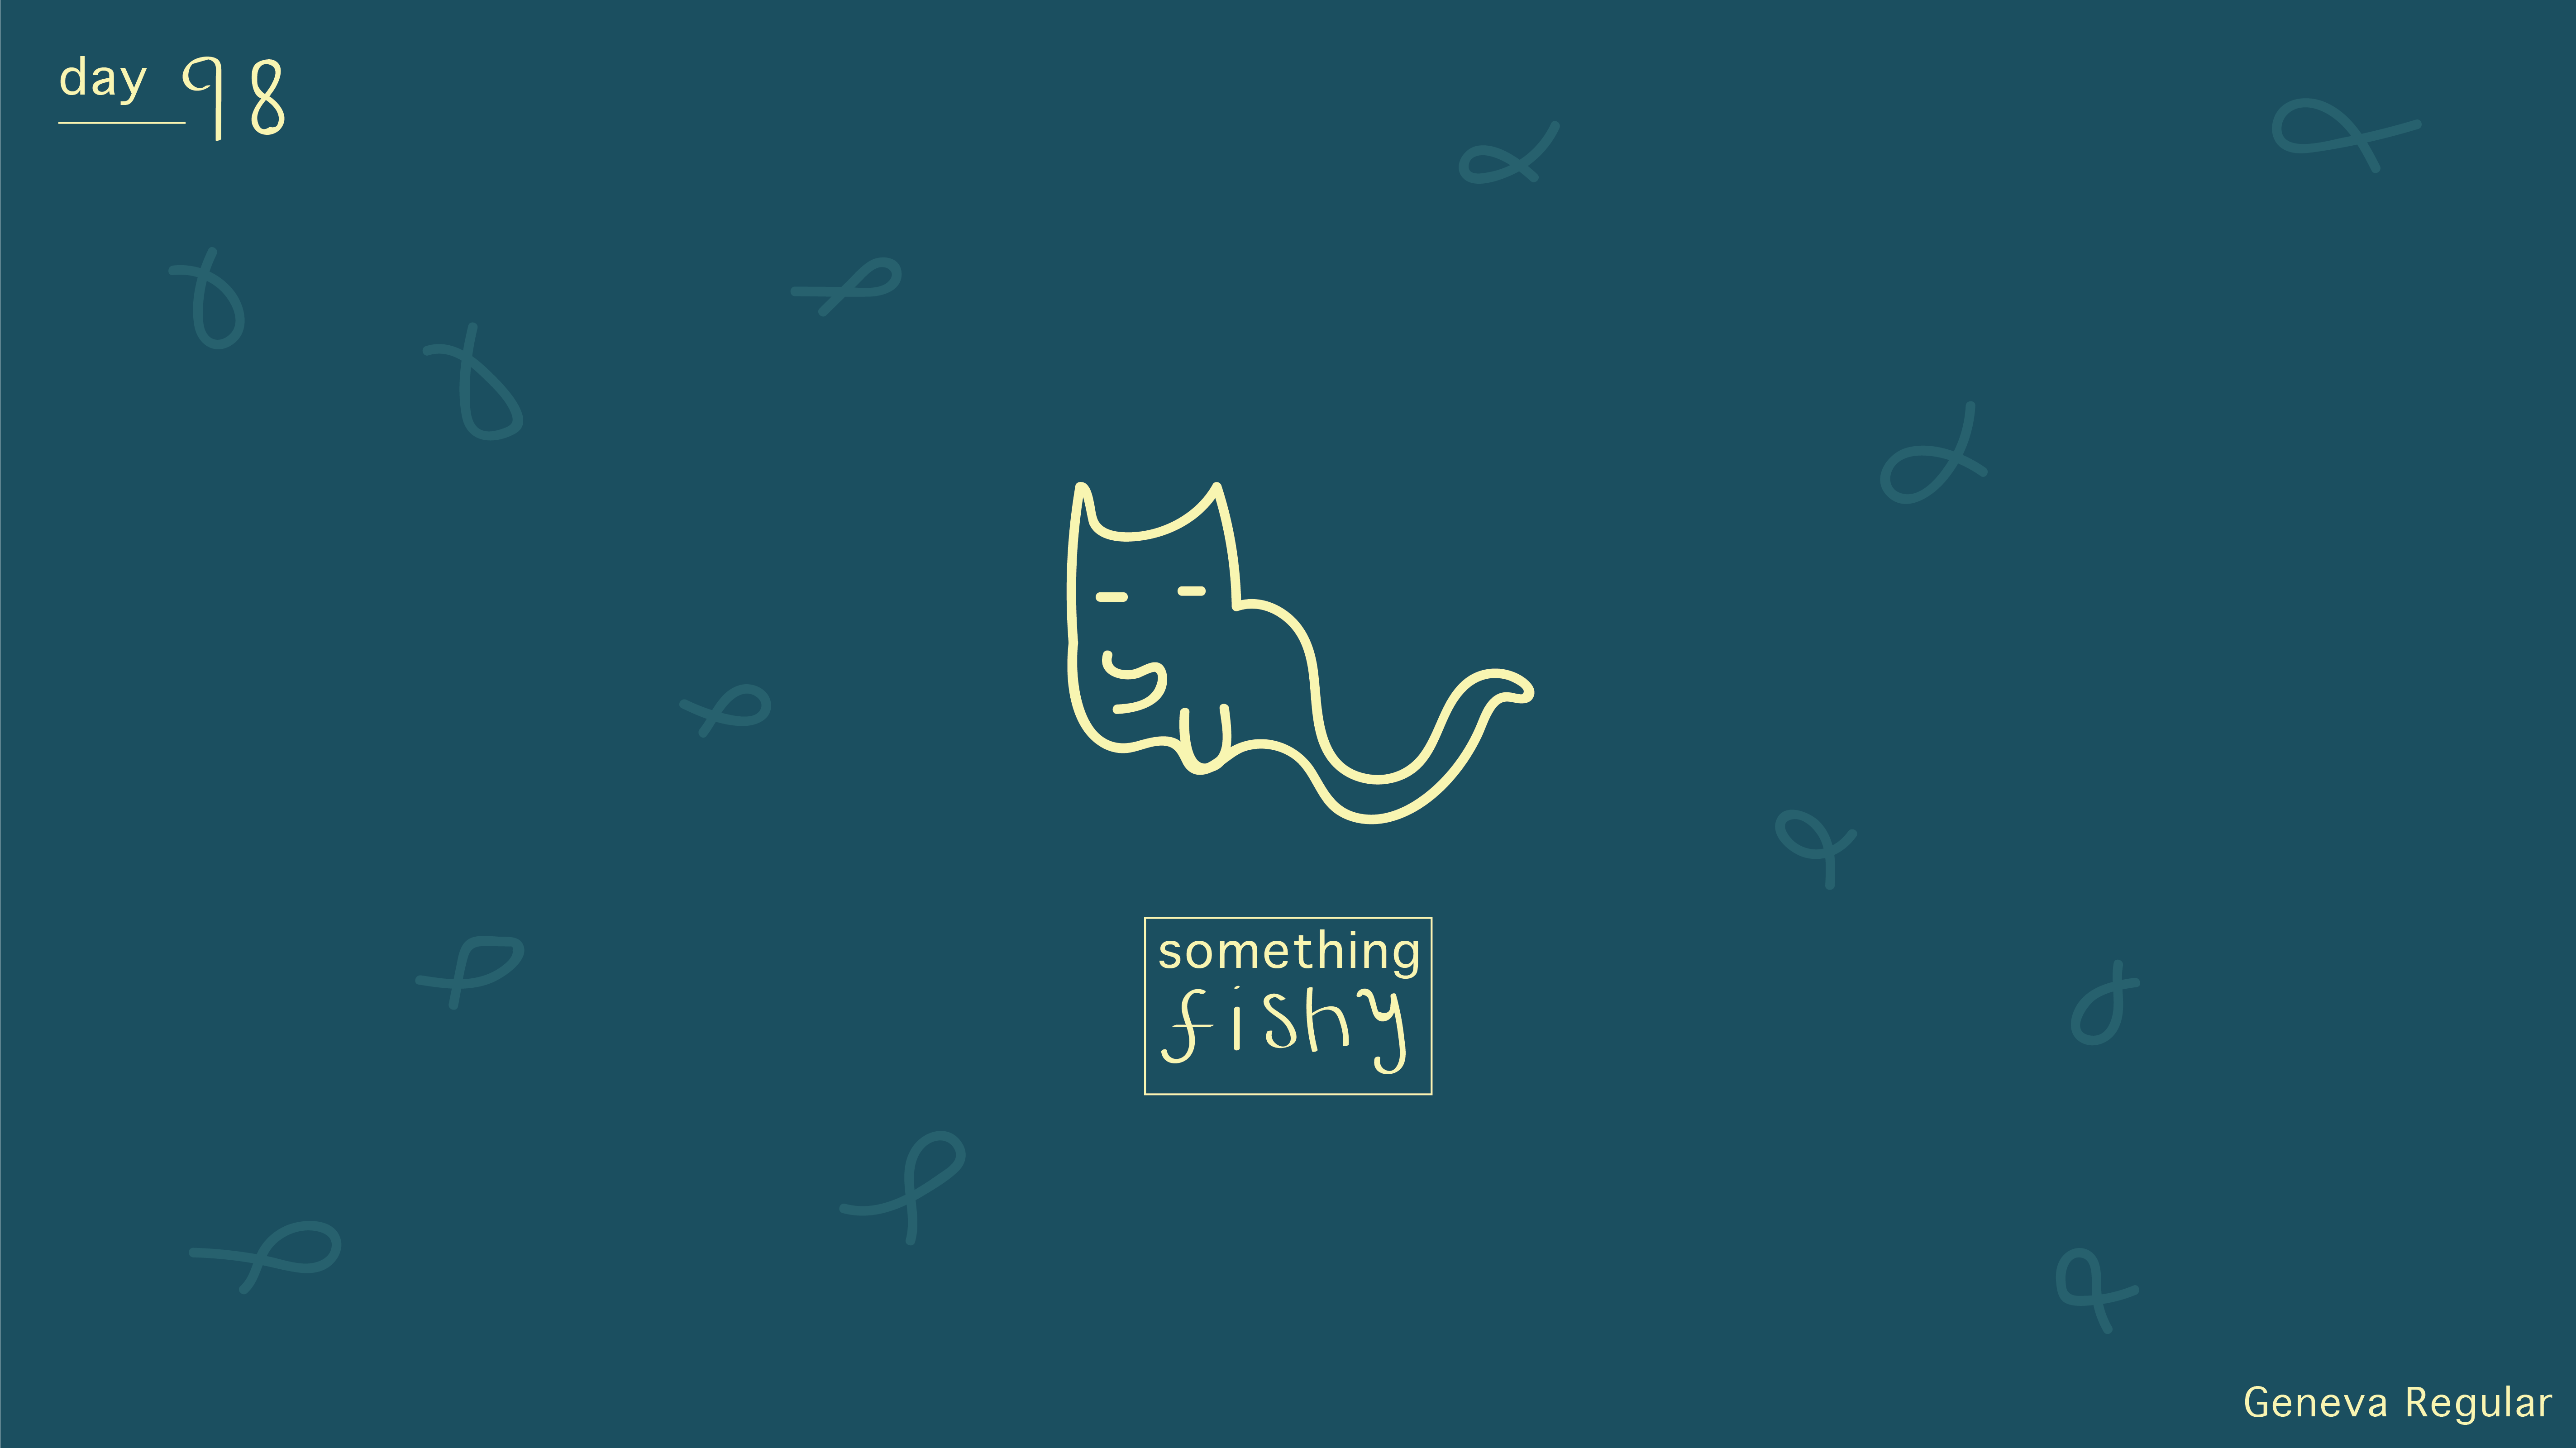 [cat]day9-08